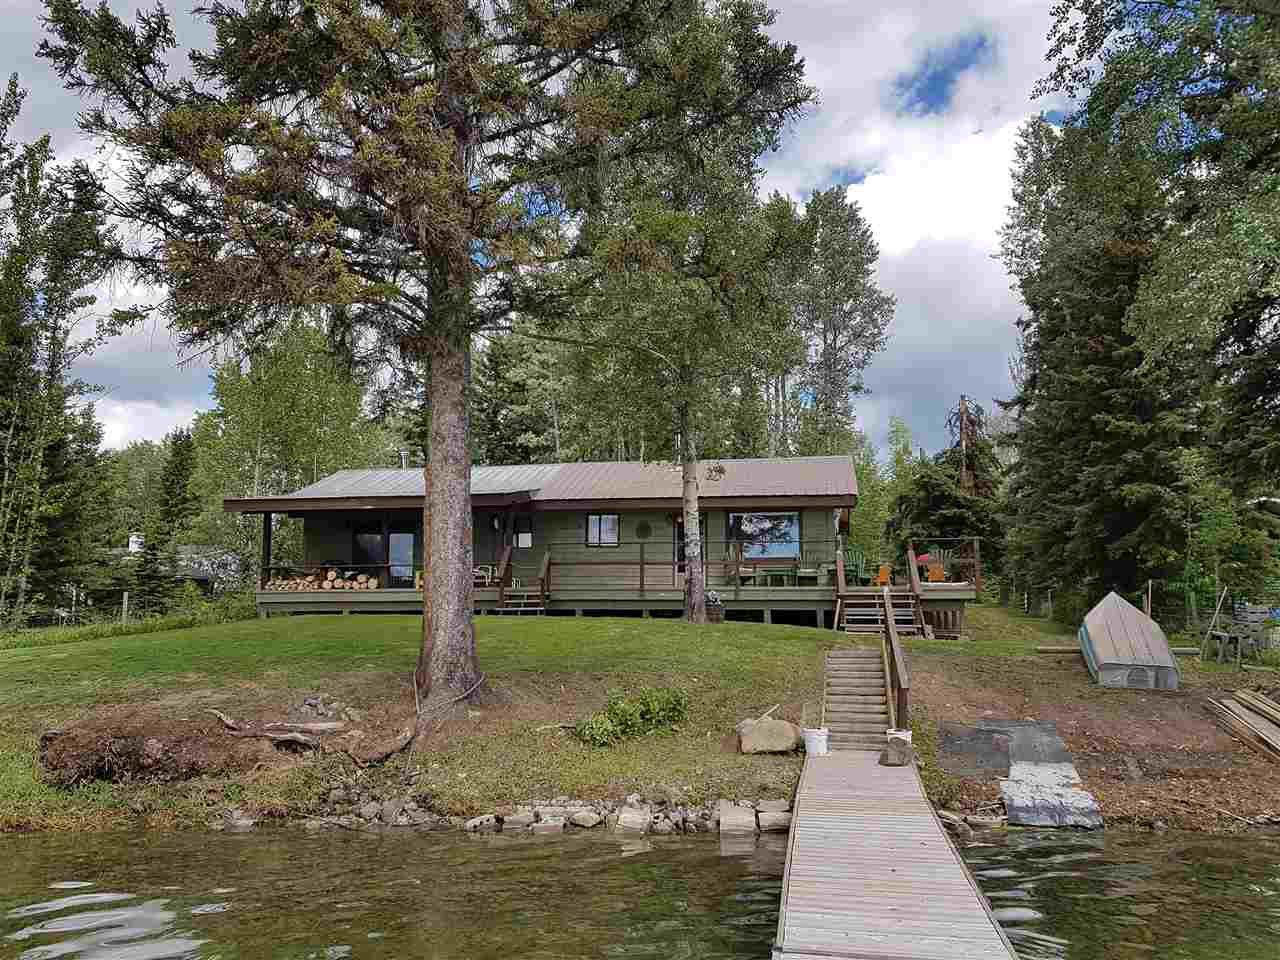 Photo 7: Photos: 7898 DEAN Road in Bridge Lake: Bridge Lake/Sheridan Lake House for sale (100 Mile House (Zone 10))  : MLS®# R2274404